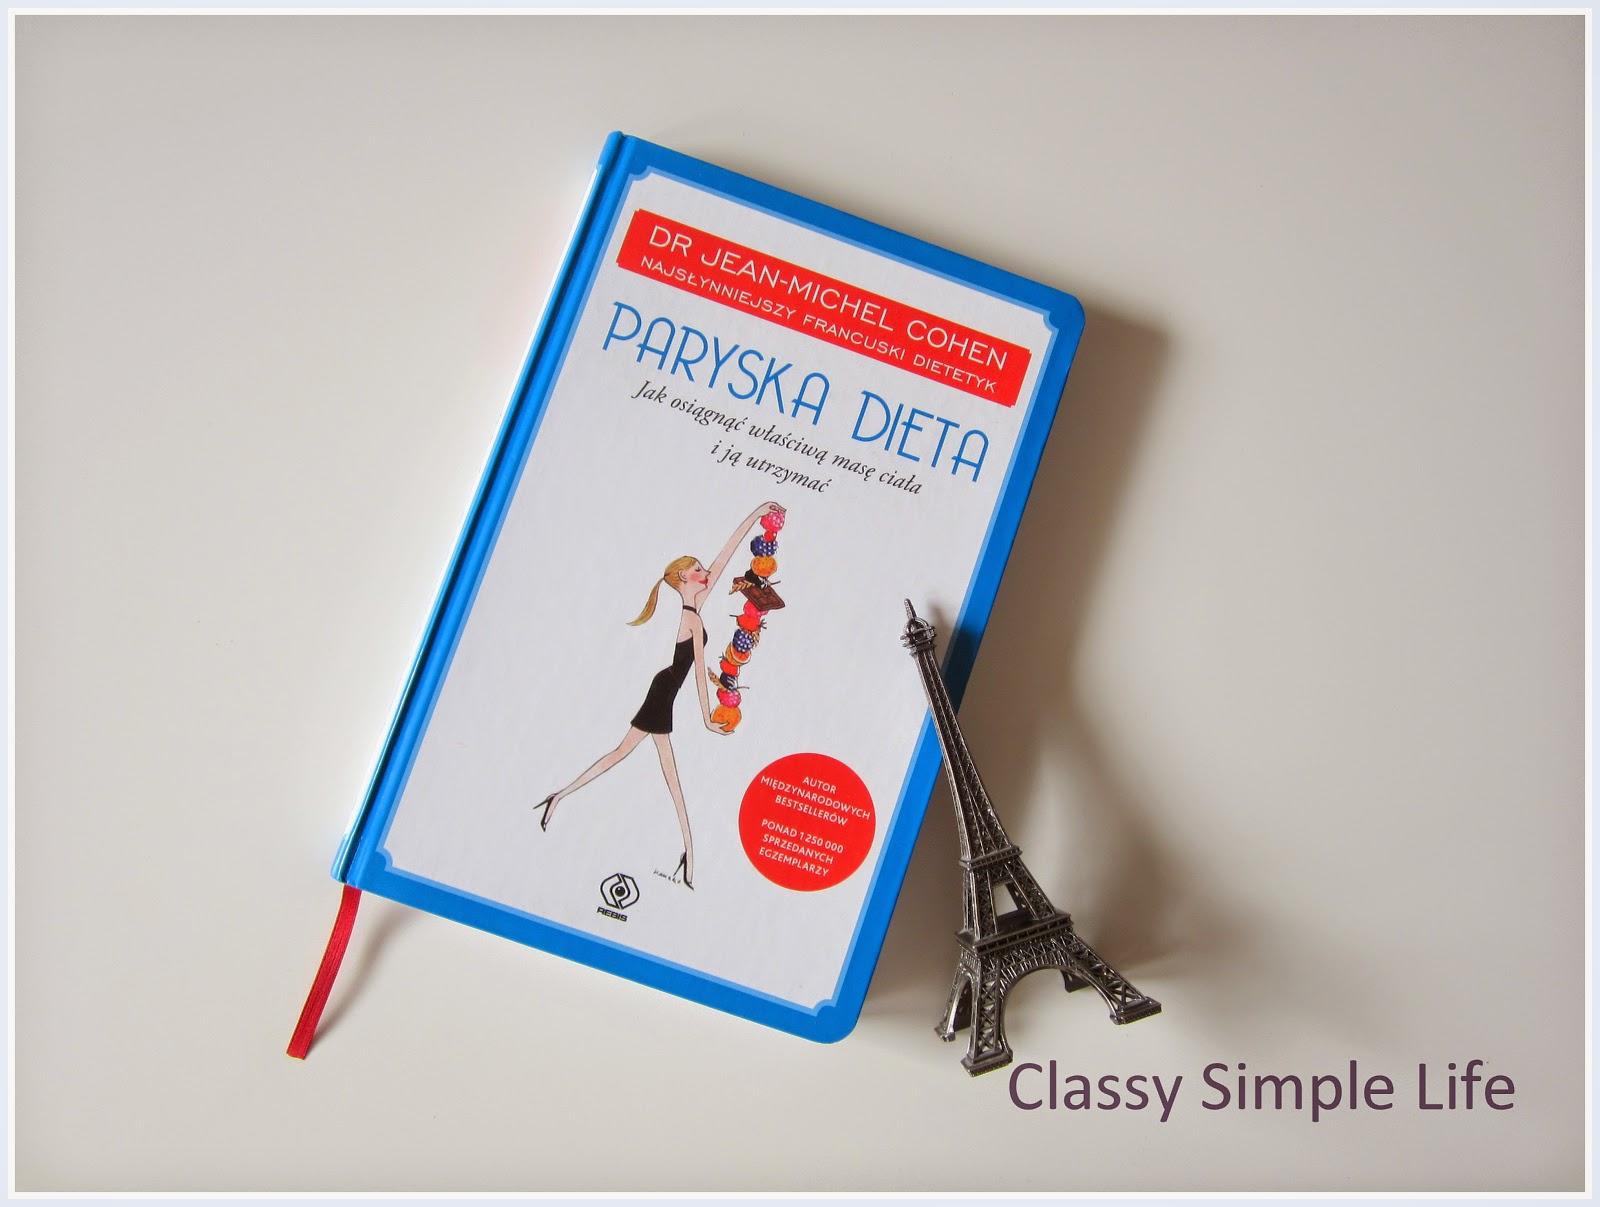 classy_simple_life